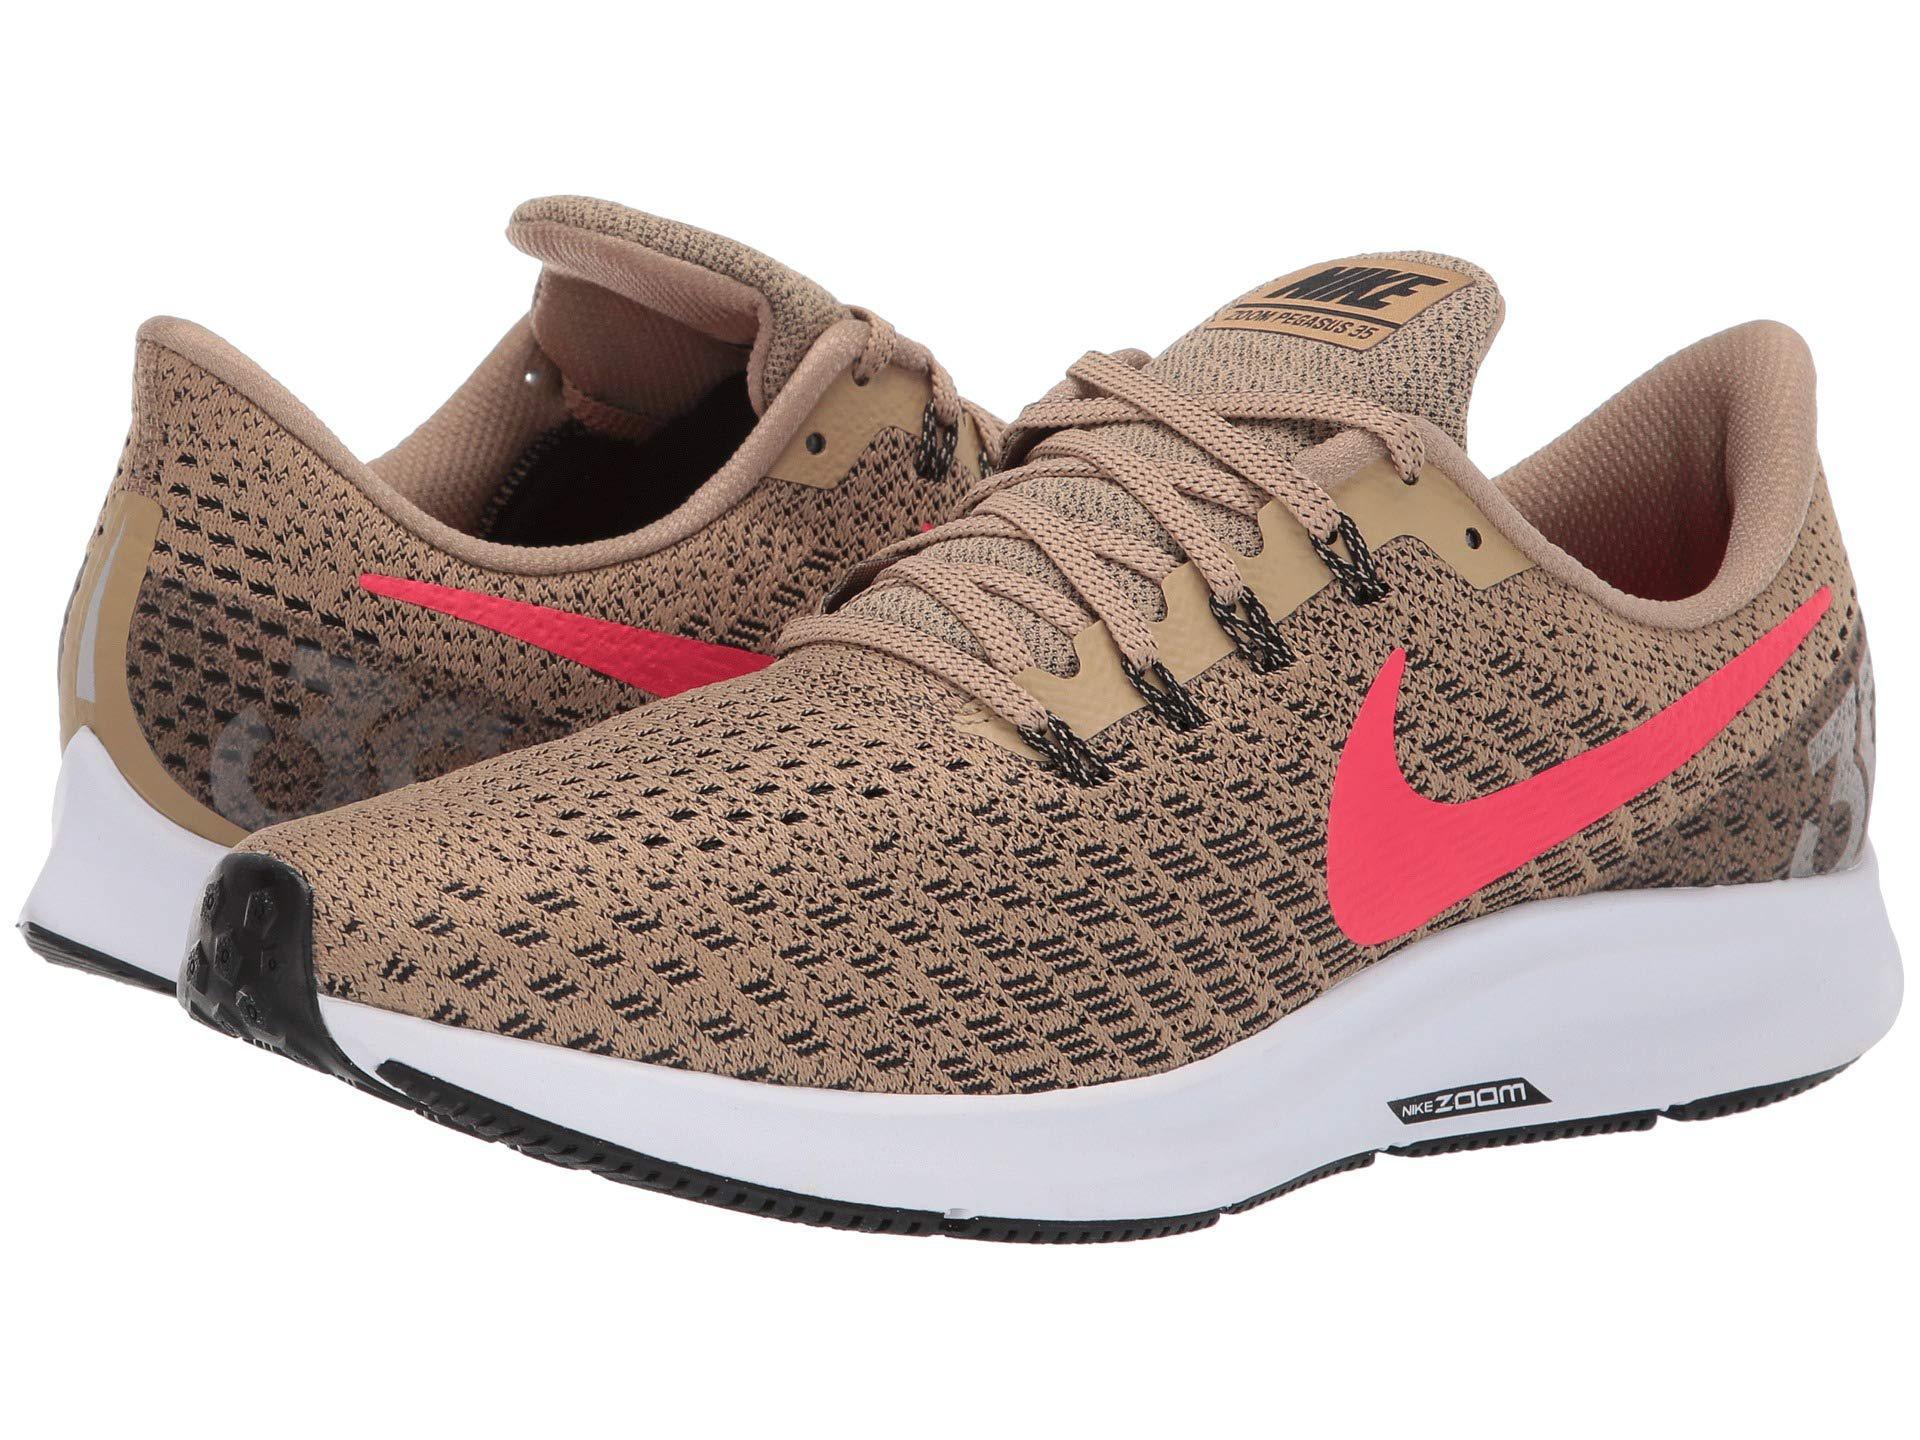 4f5cb345908 Nike. Air Zoom Pegasus 35 (light Silver dark Stucco twilight Marsh) Men s  Running Shoes